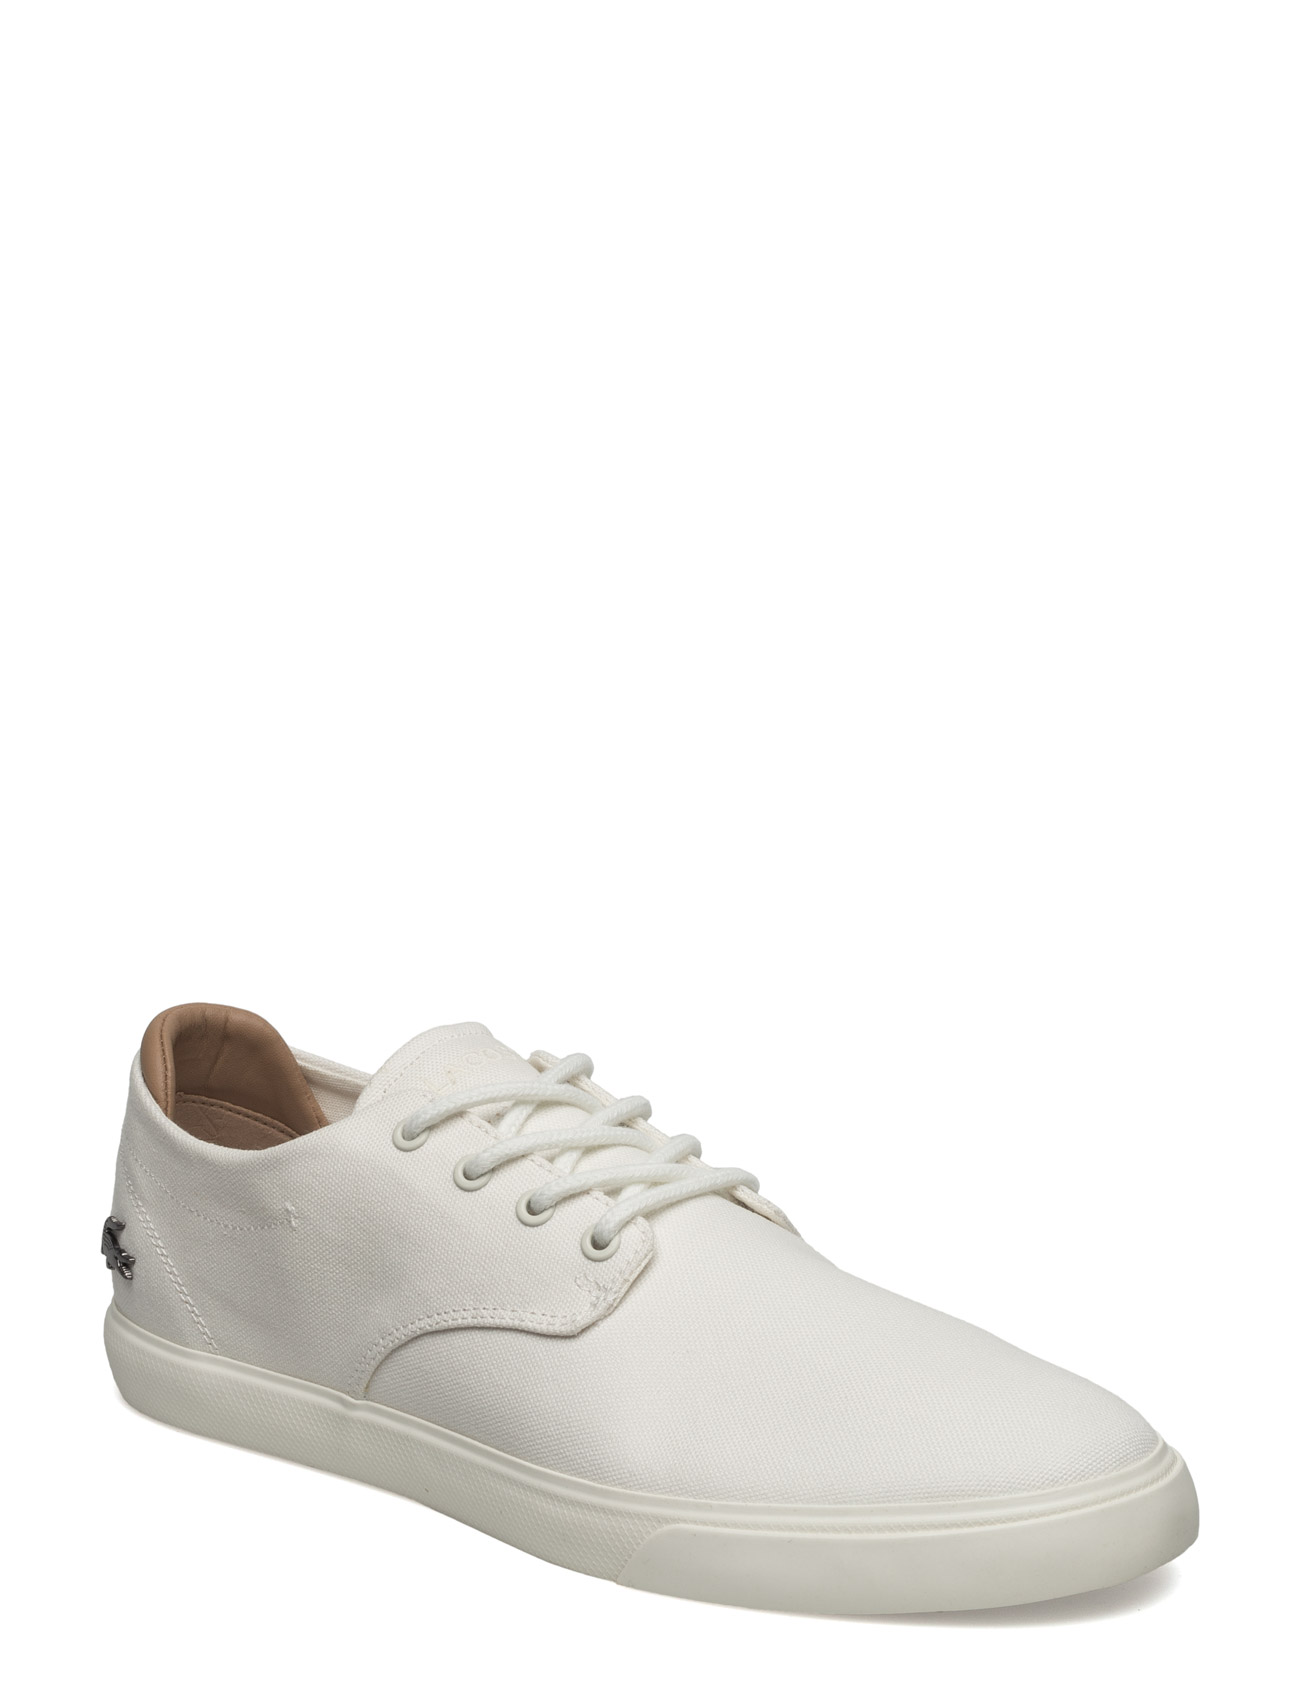 lacoste shoes – Espere 217 1 fra boozt.com dk